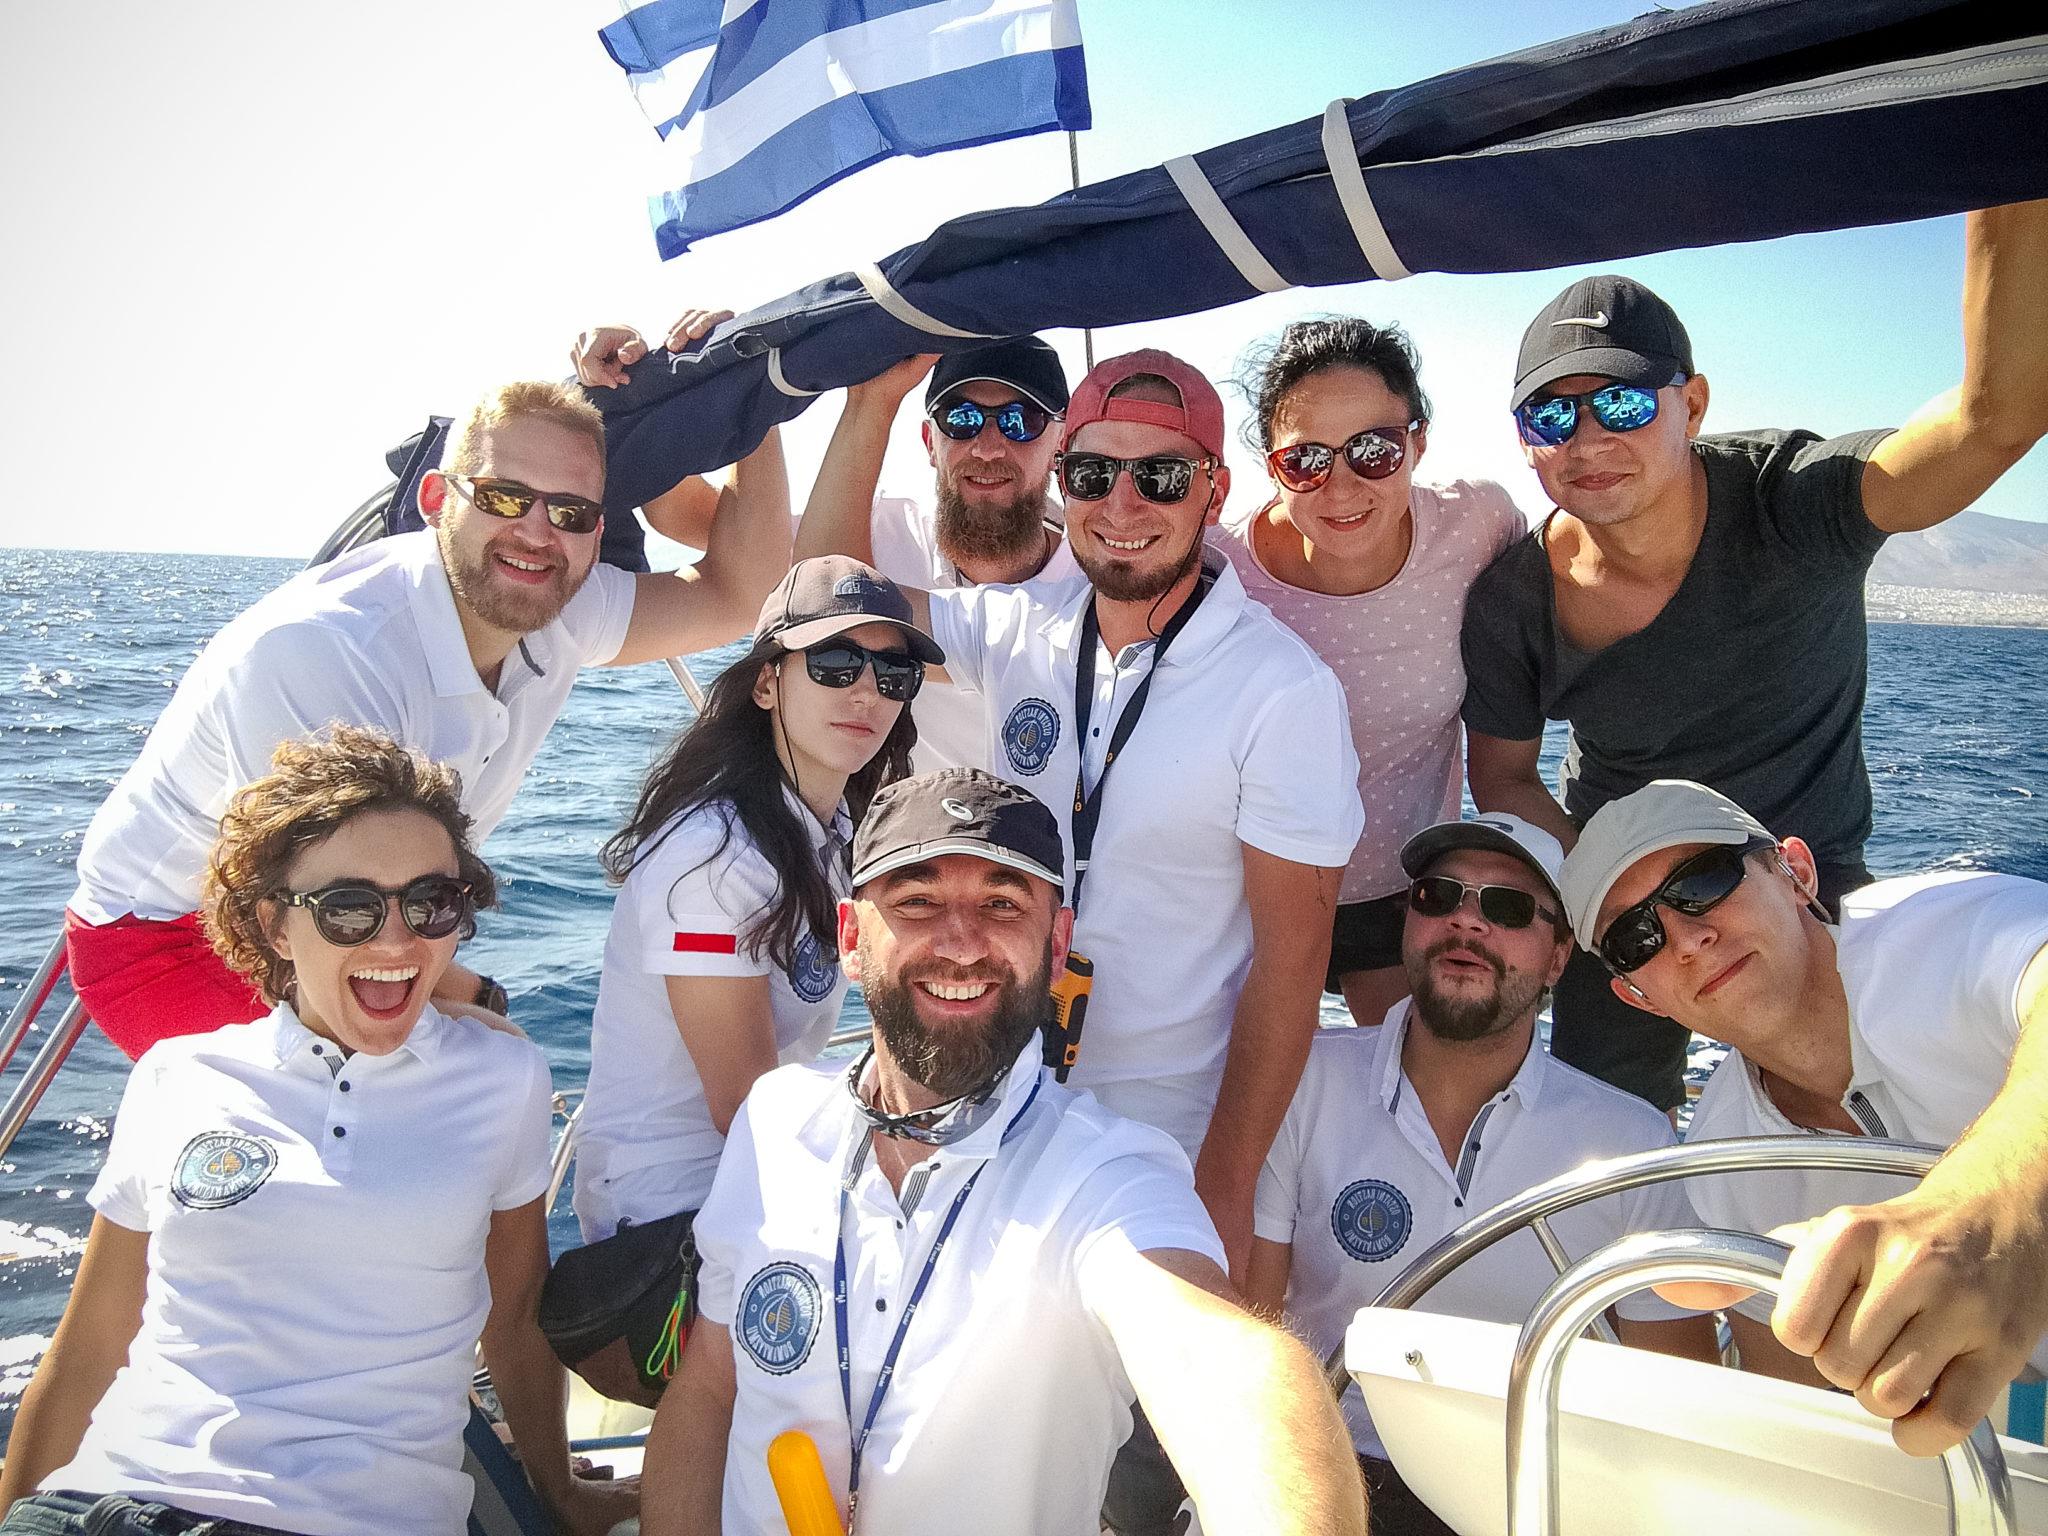 Załoga s/y Alexandra na trasie Ateny - Egina